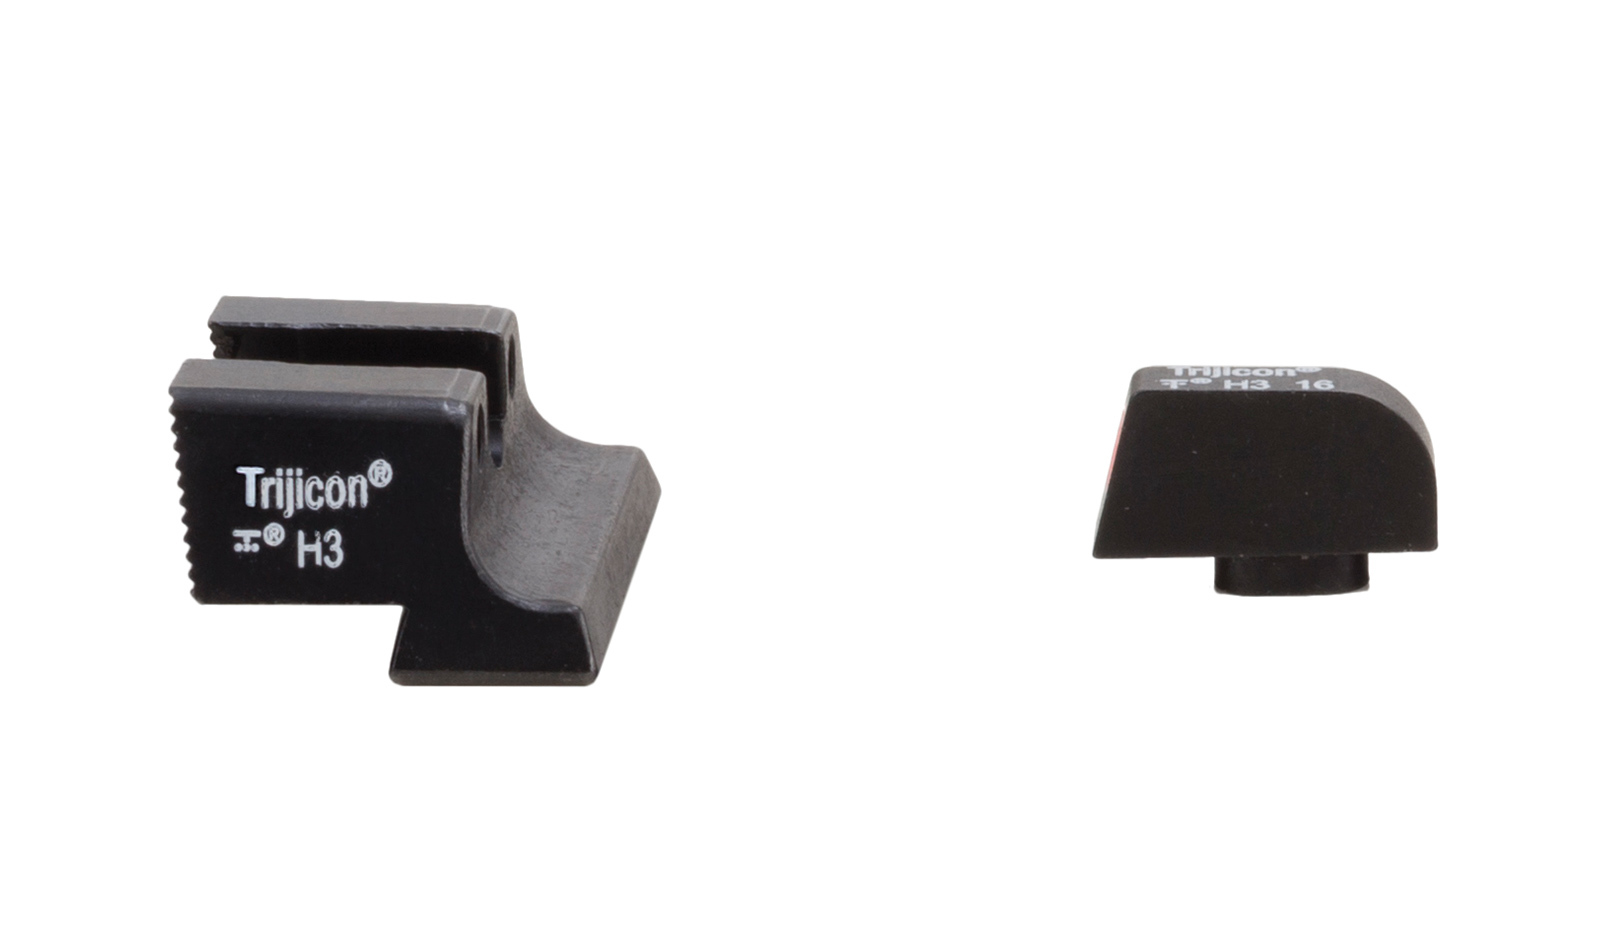 Trijicon HD XR Night Sights Glock Standard Frames Orange Qutline Bild 02